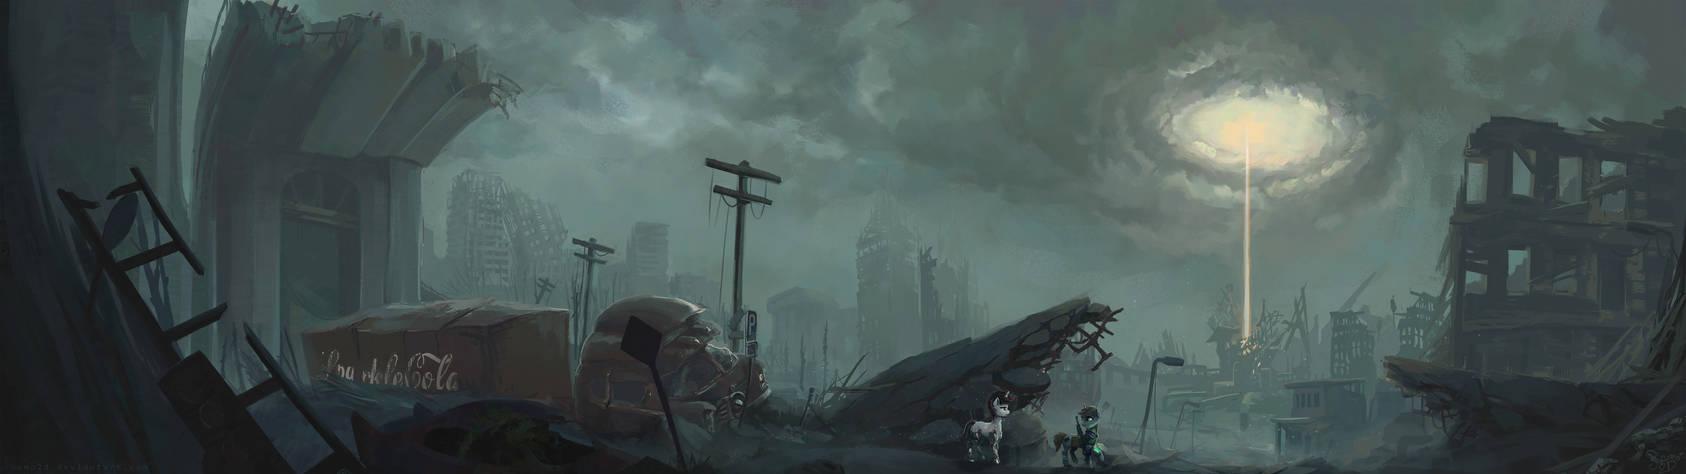 Manehattan Ruins